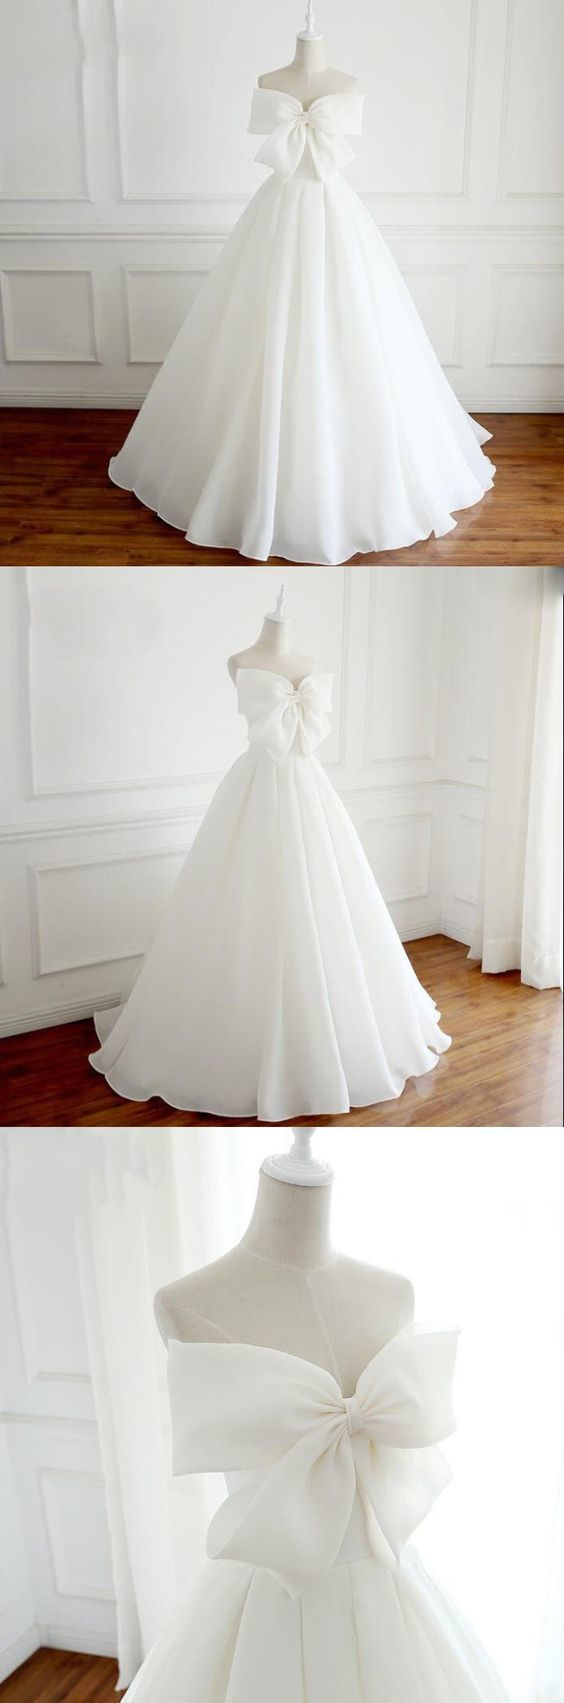 160 Best New Designer Dresses Images On Pinterest Minimal Tulle Embroidery Dress Fleur Land Putih S Glamorous Unique Design White A Line Elegant Formal Weeding With Bow